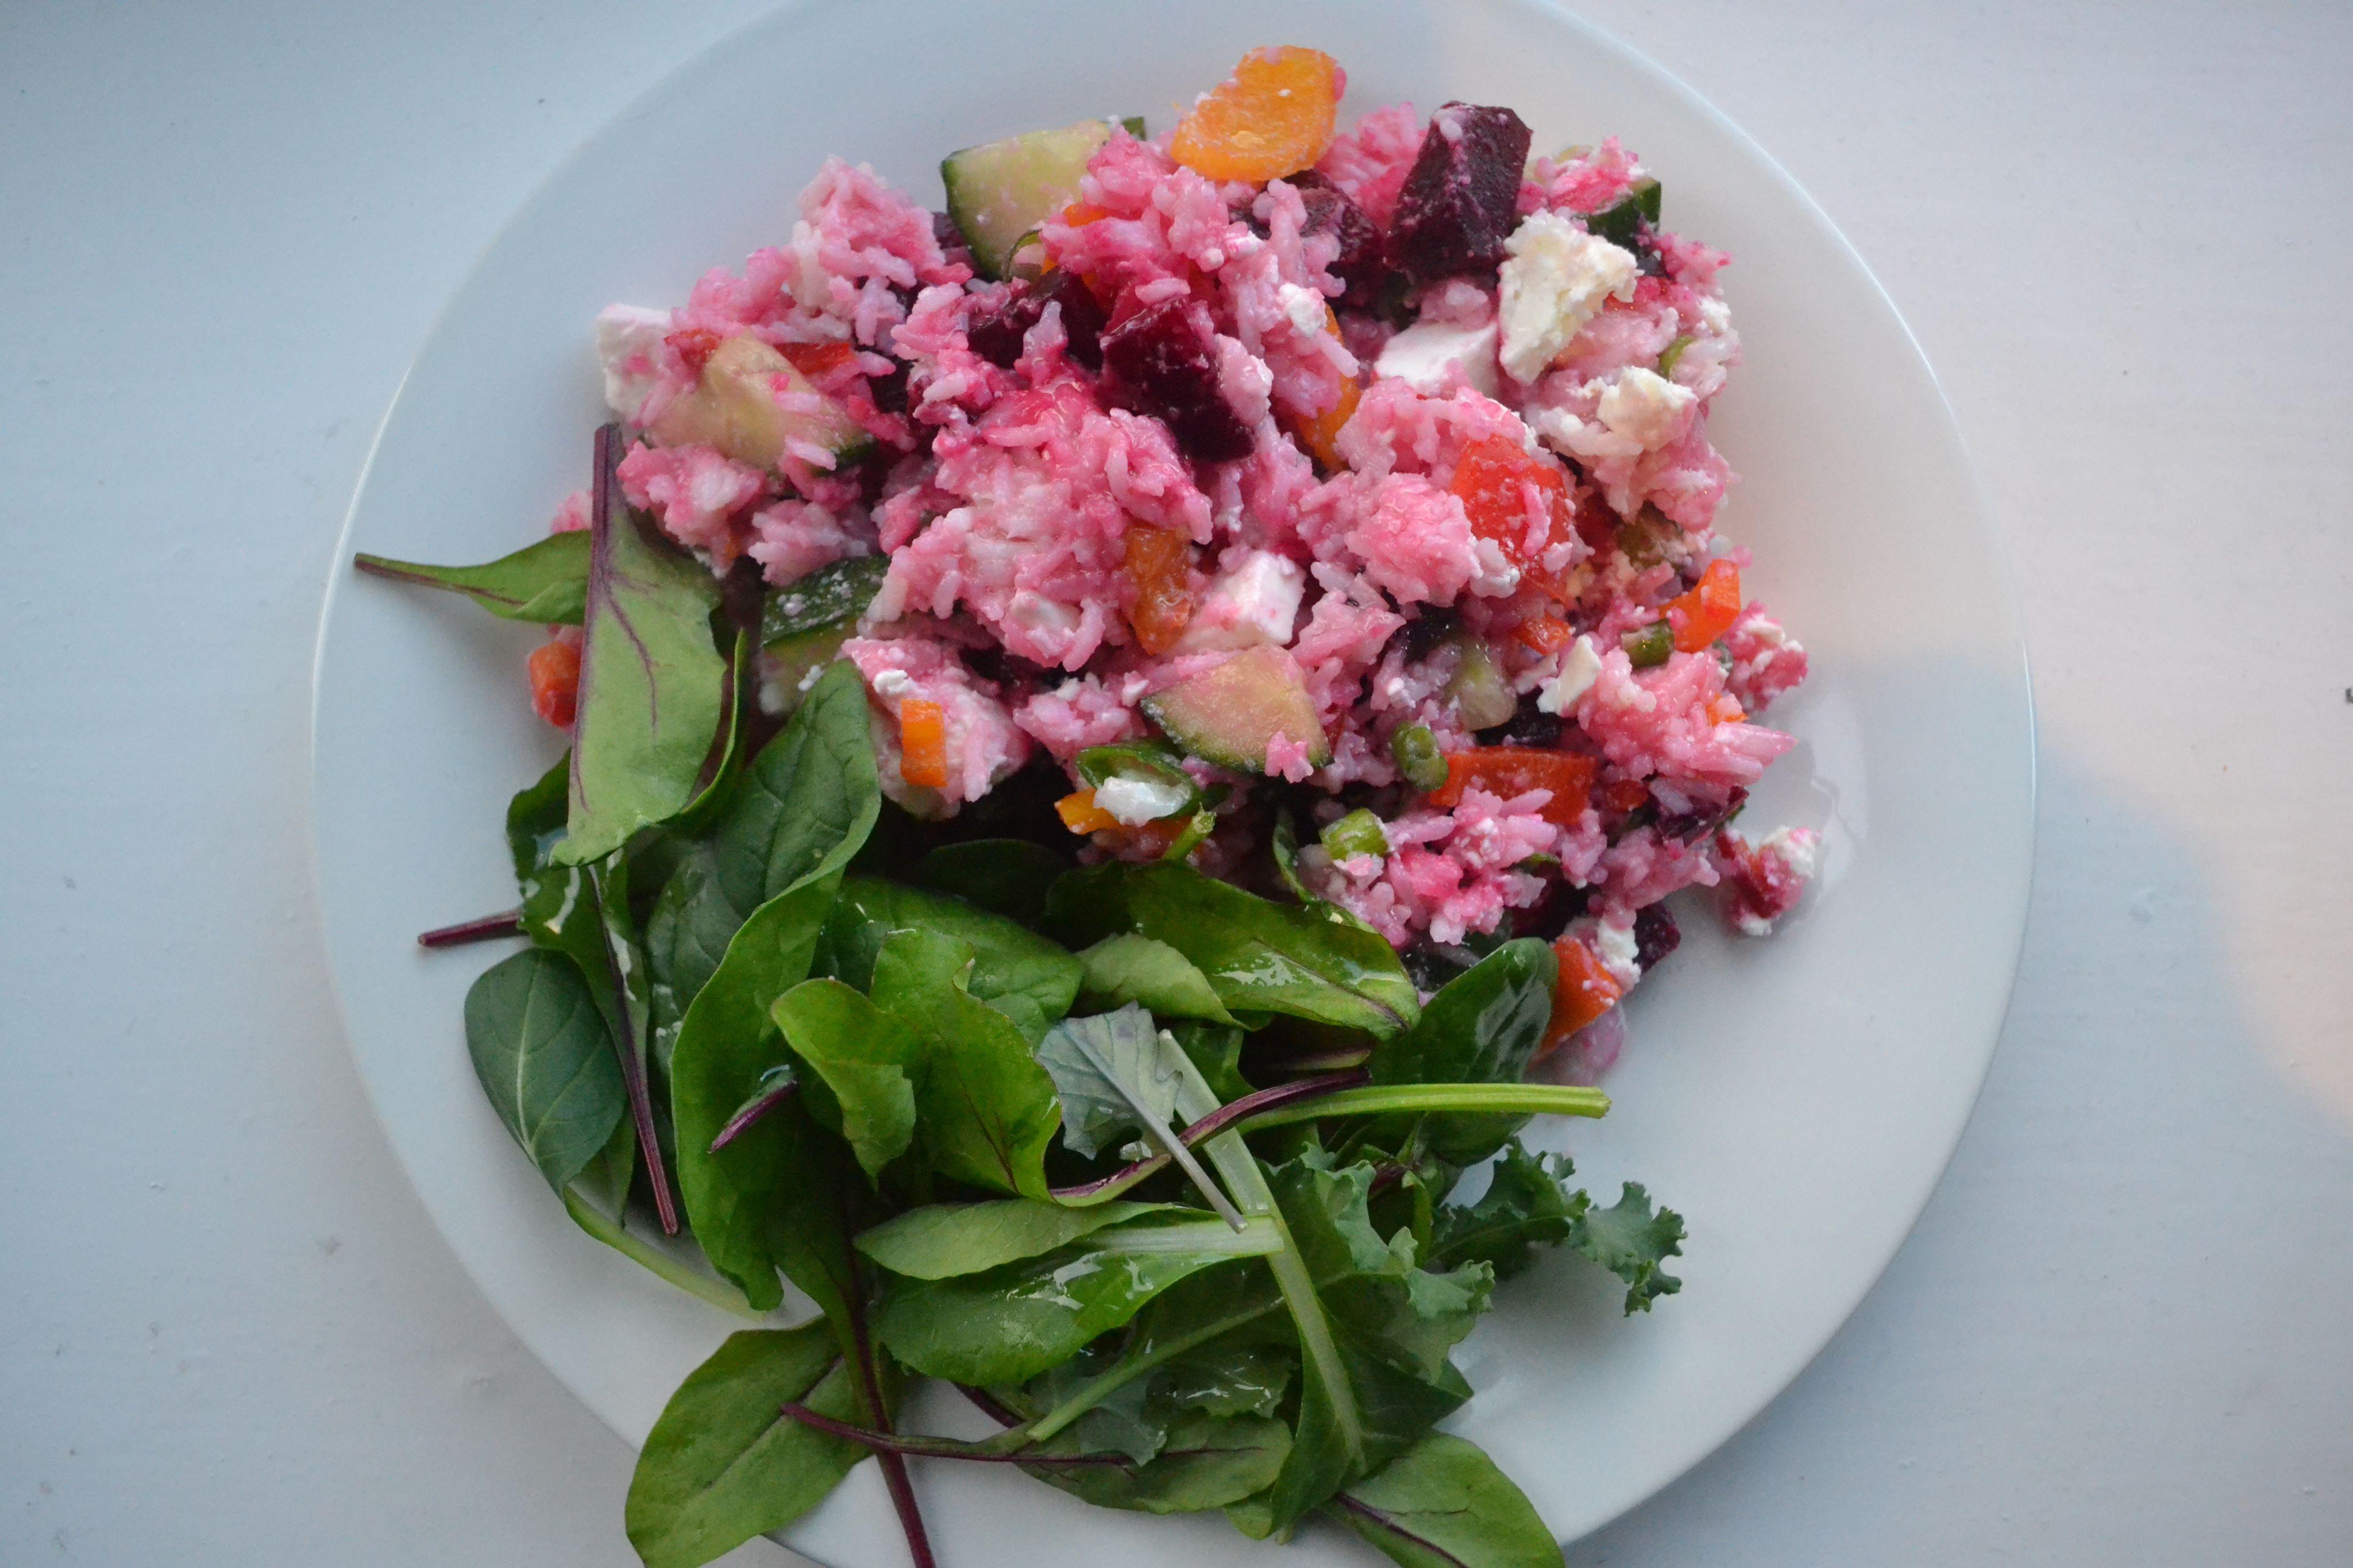 Beetroot and Feta Rice Salad